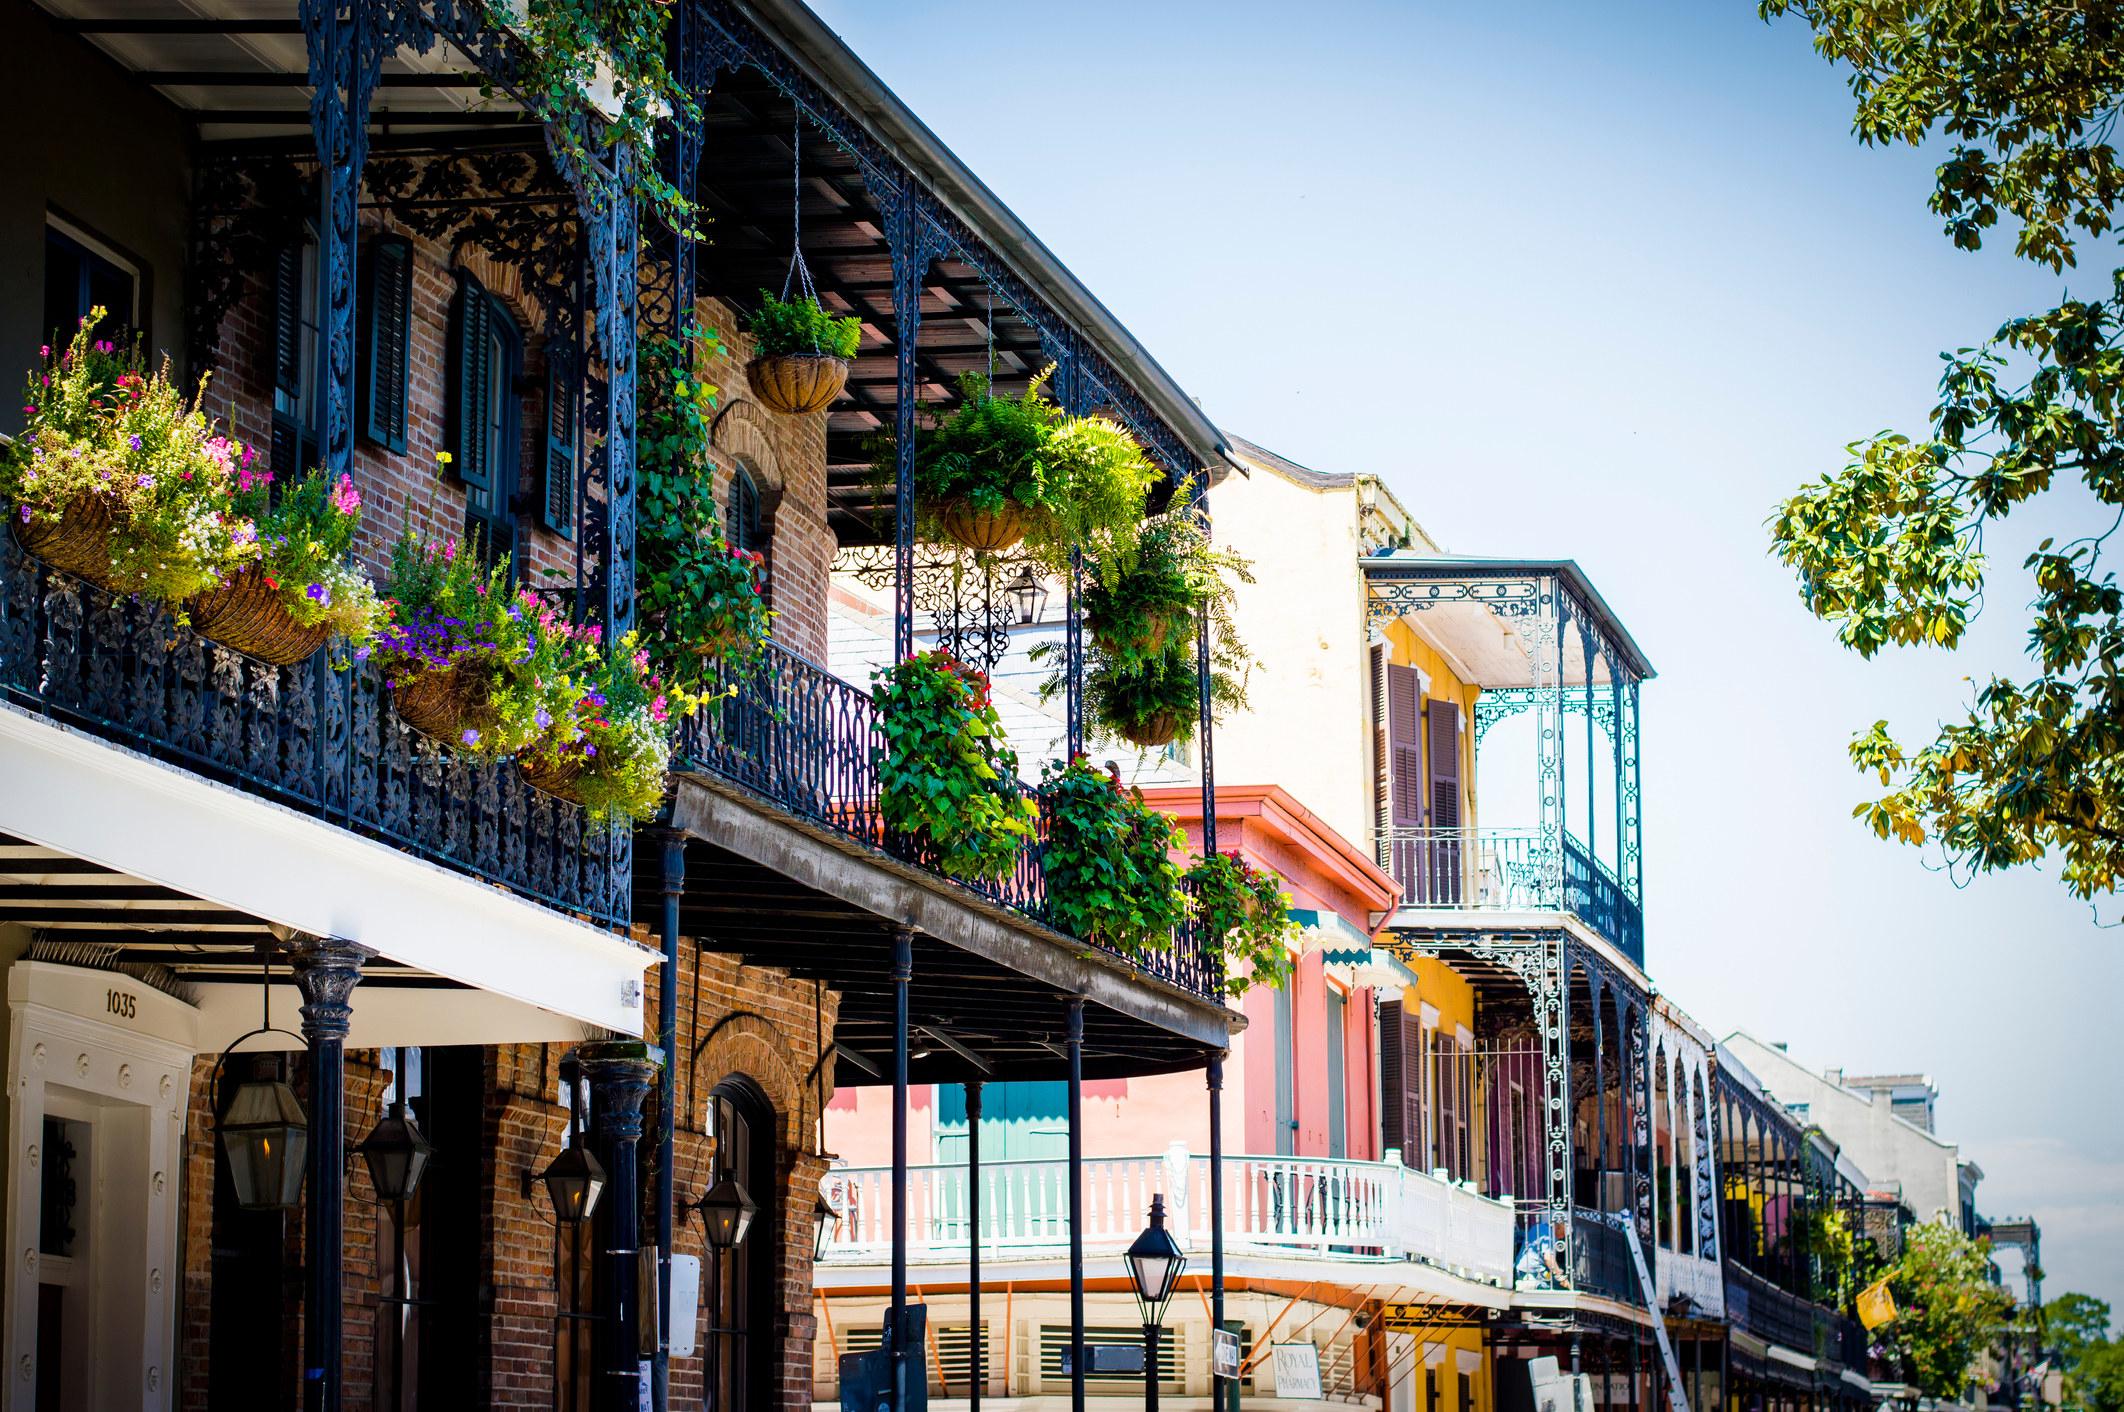 Balconies in New Orleans.